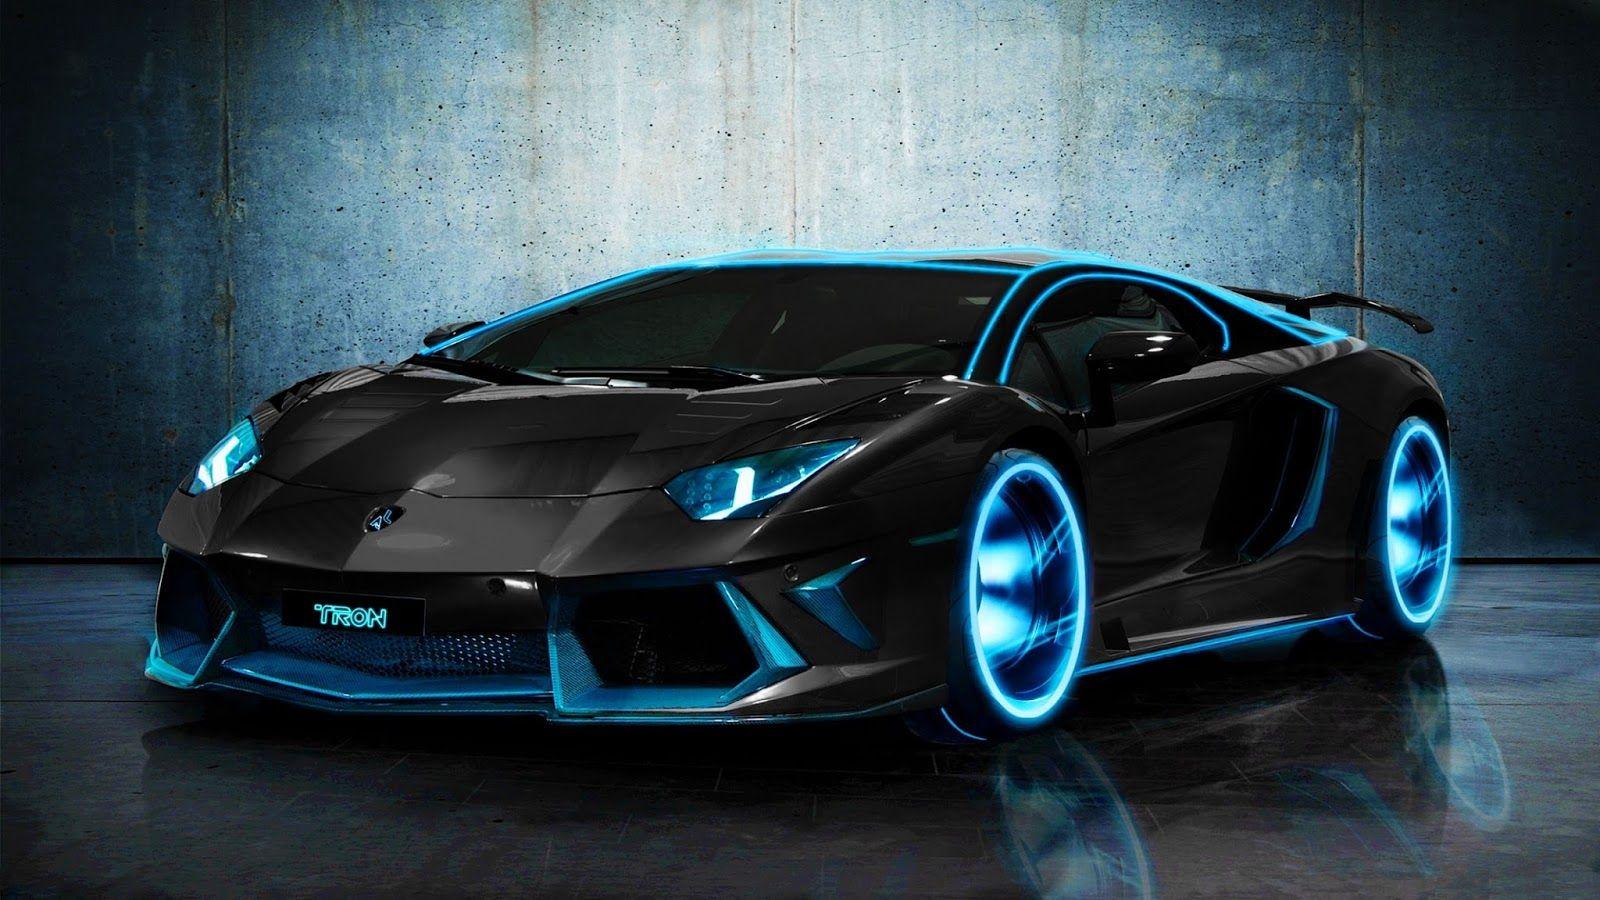 Beautiful Lamborghini Sesto Elemento Wallpaper With Images